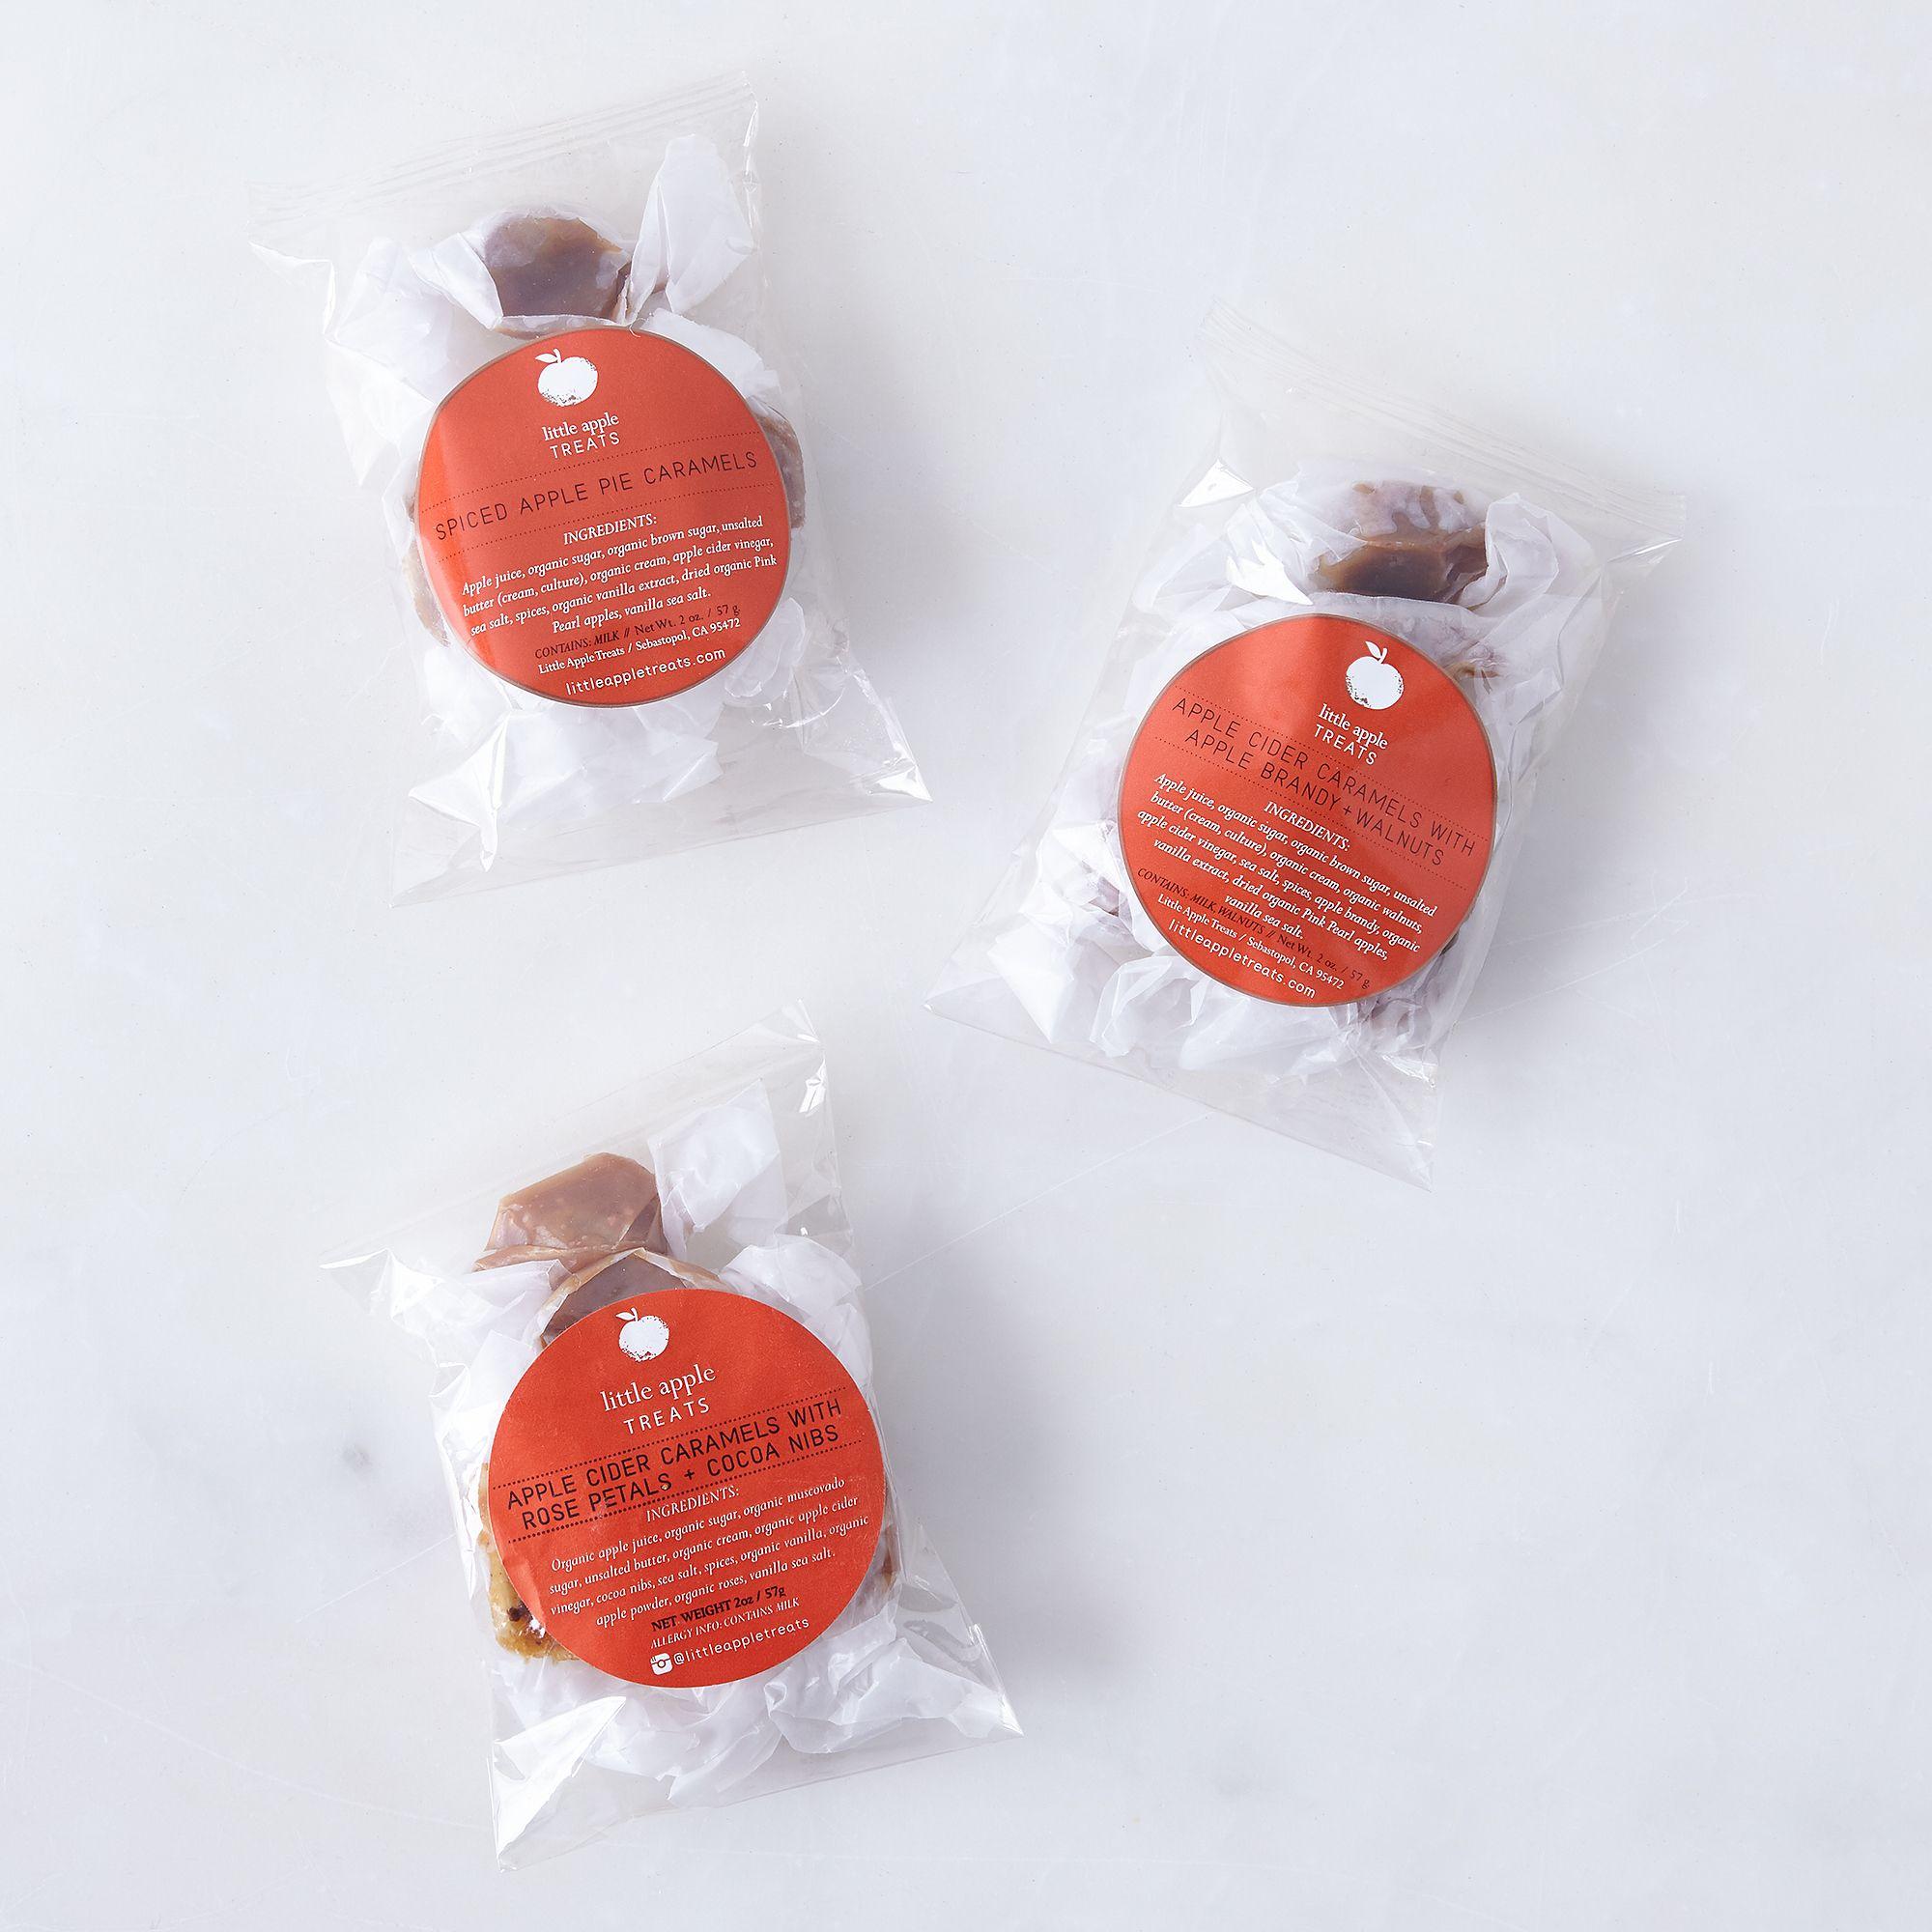 1ac89b22 c55a 4e90 9e1a 422a77699a02  2016 0923 little apple treats caramel gift box option 1 silo rocky luten 233